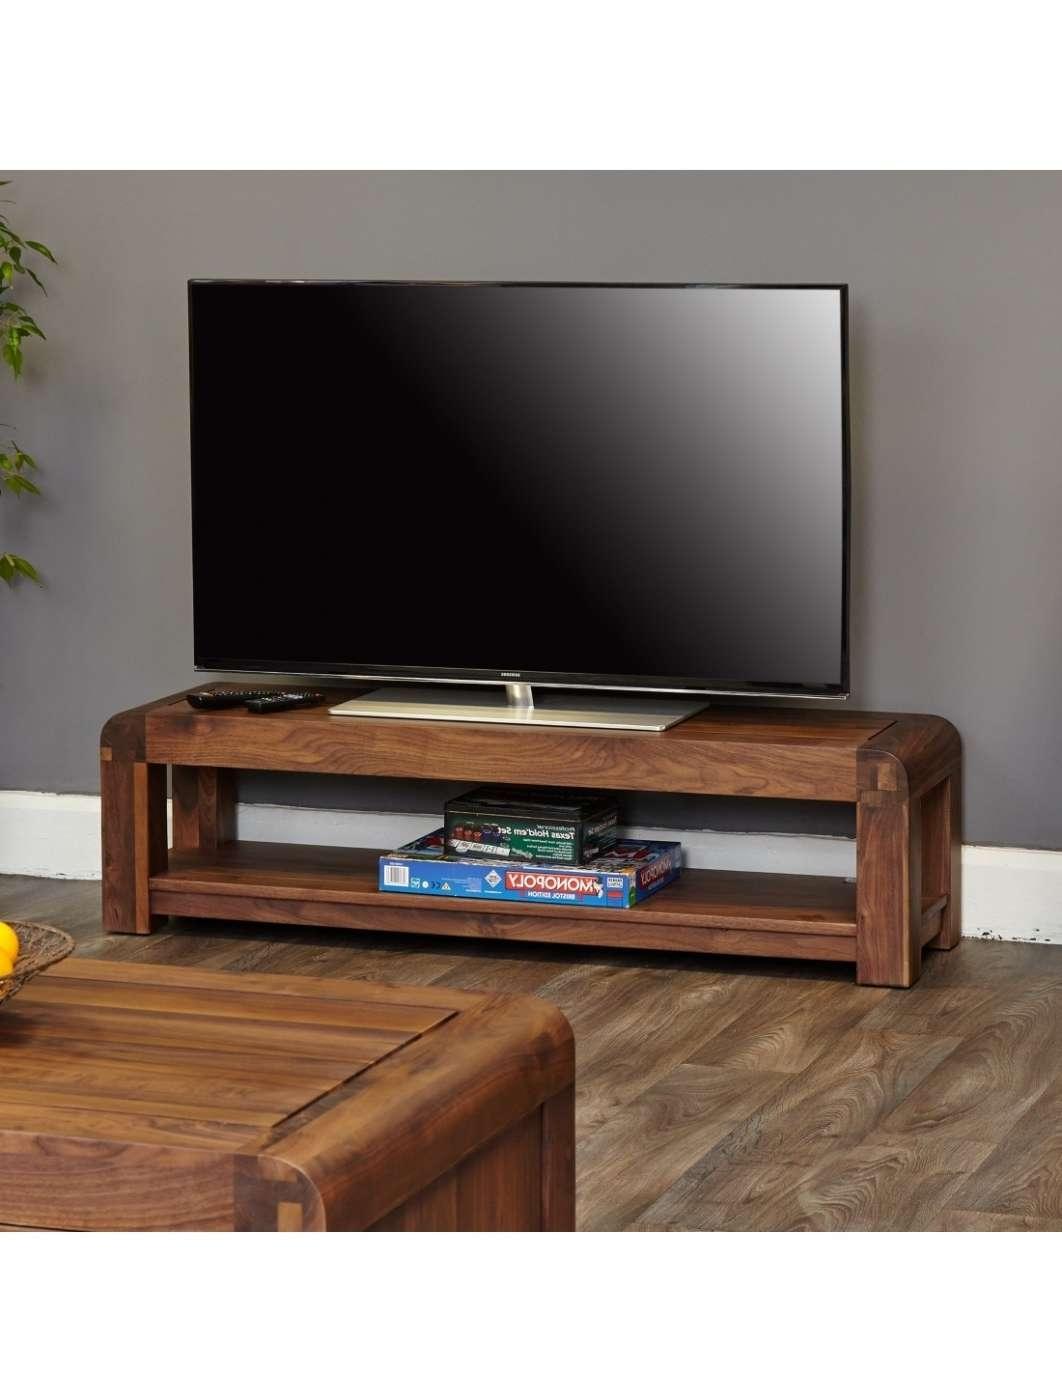 Low Widescreen Tv Stand Baumhaus Shiro Walnut Cdr09a   121 Tv Mounts For Widescreen Tv Stands (View 14 of 15)